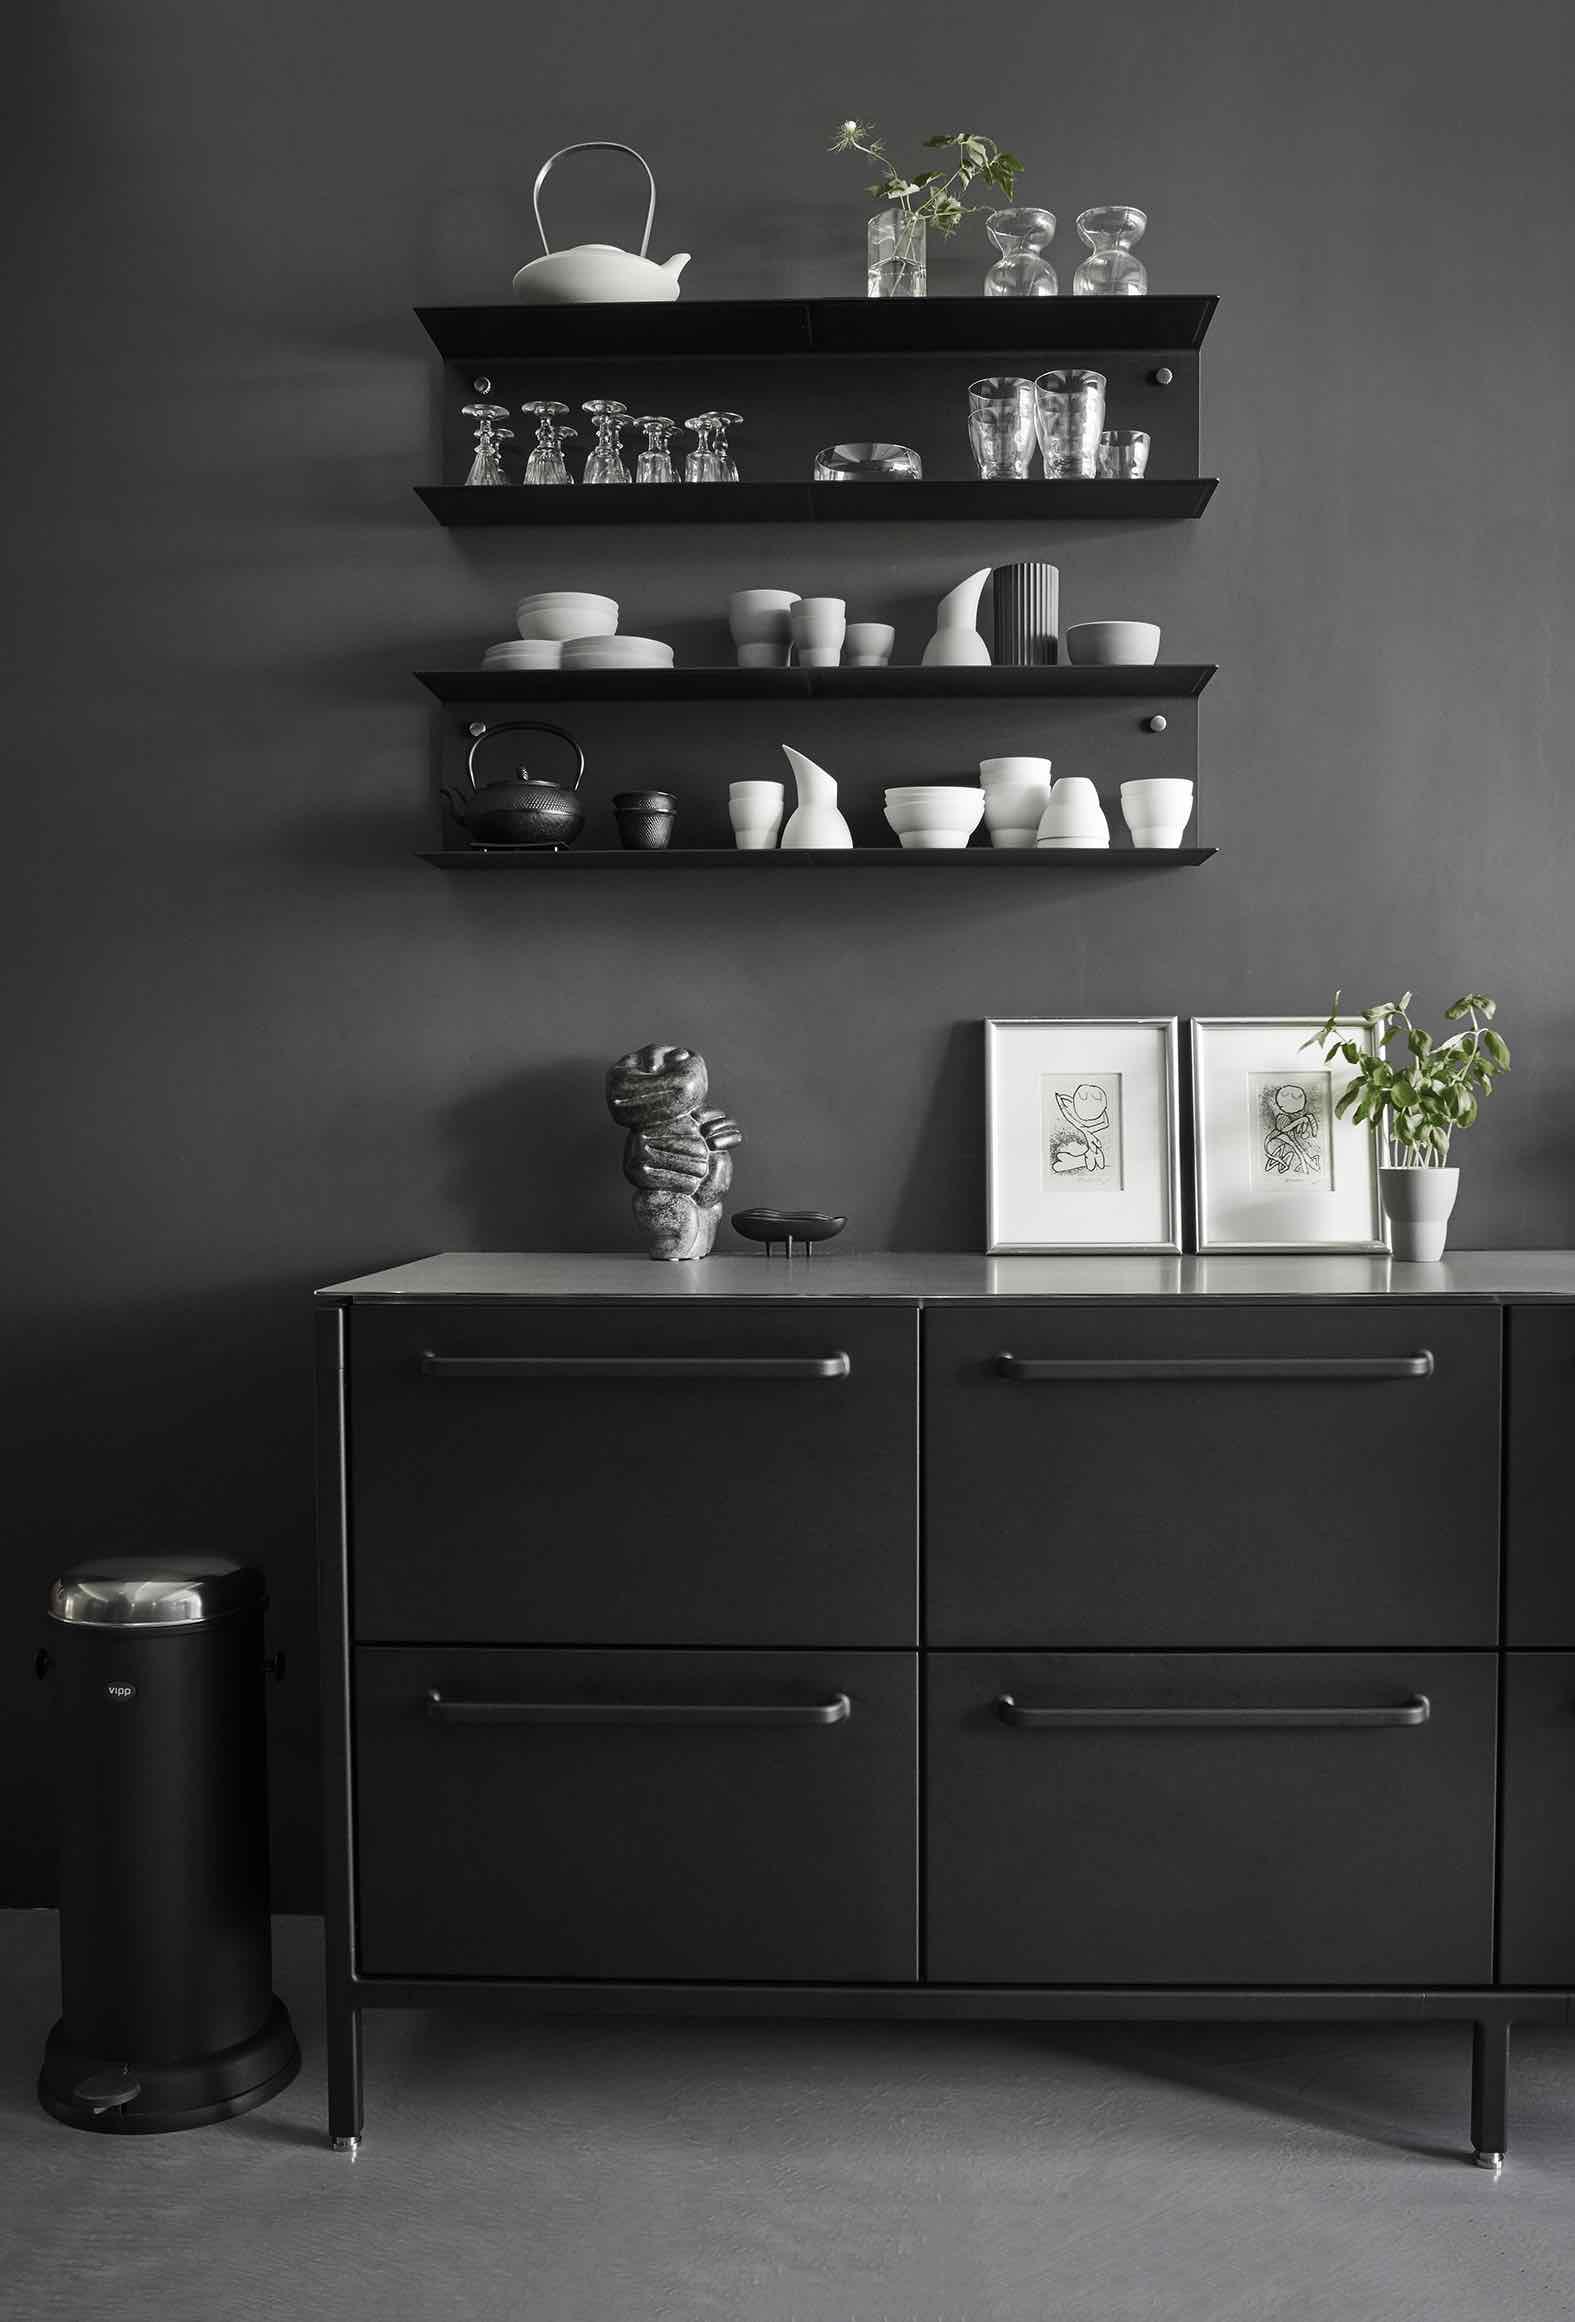 vipp k chen showroom nyc designs2love. Black Bedroom Furniture Sets. Home Design Ideas